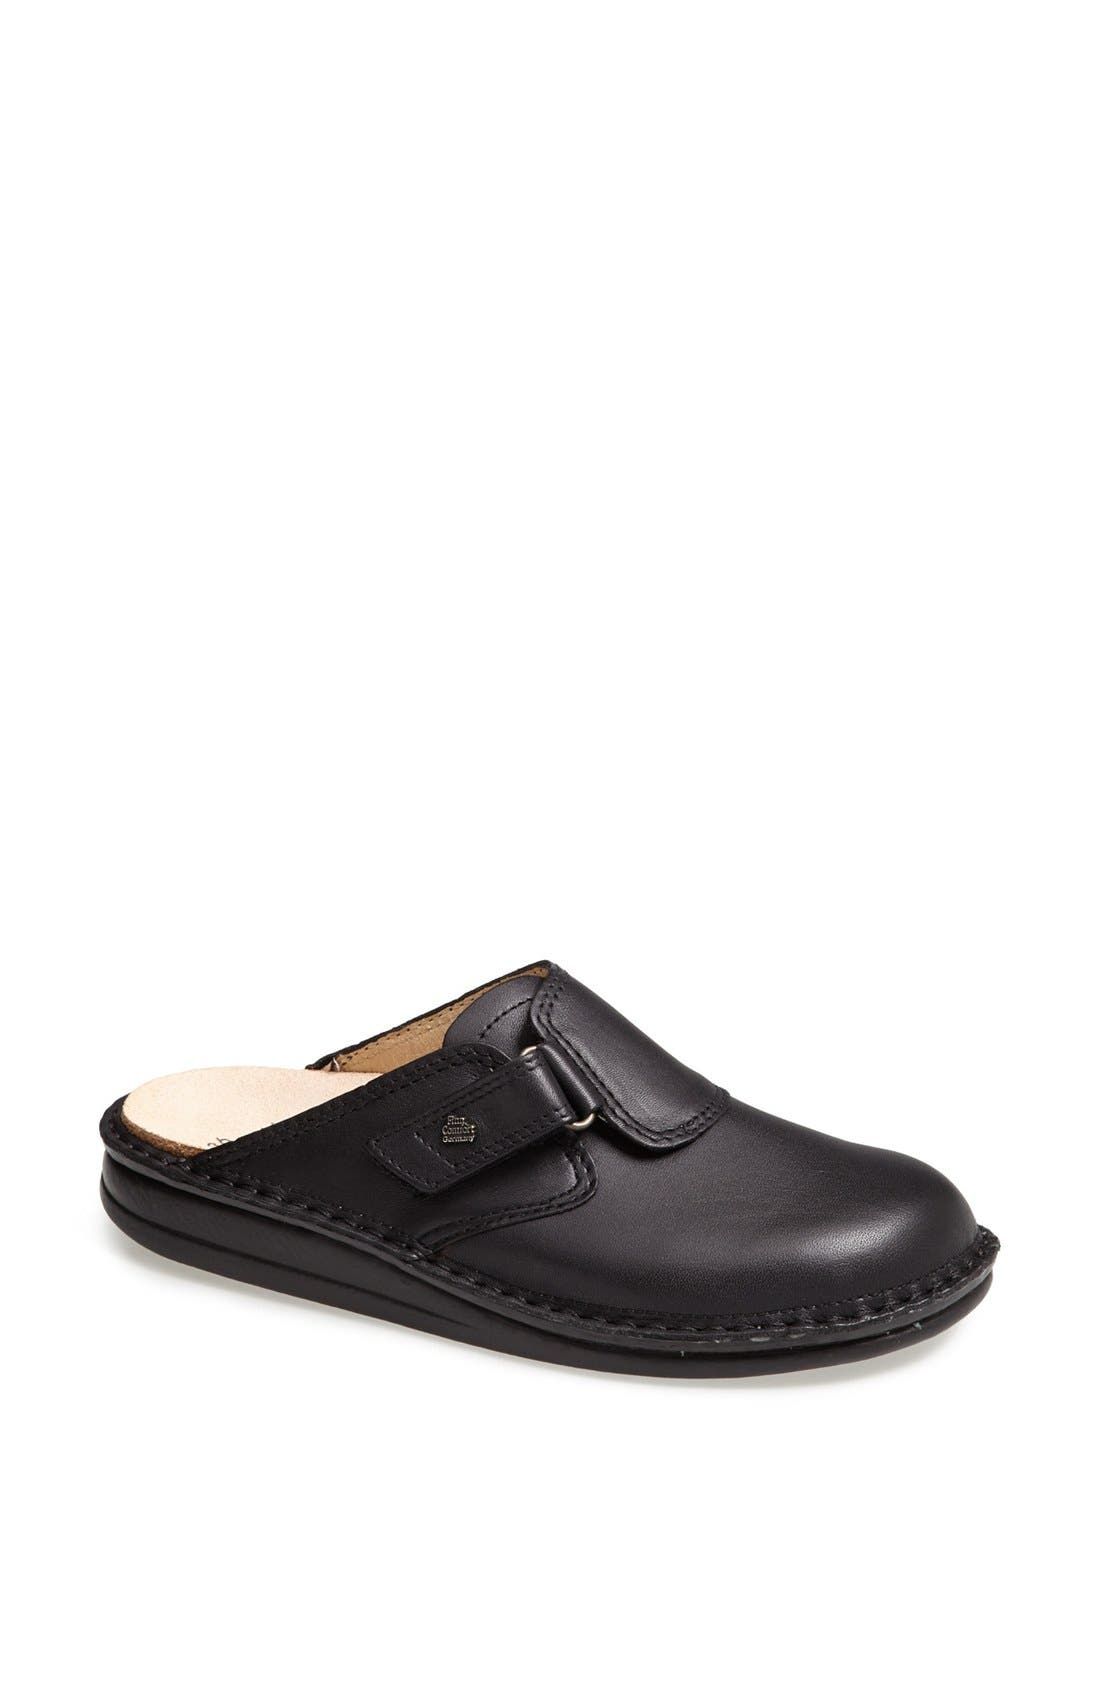 'Venice' Leather Clog,                         Main,                         color, Black